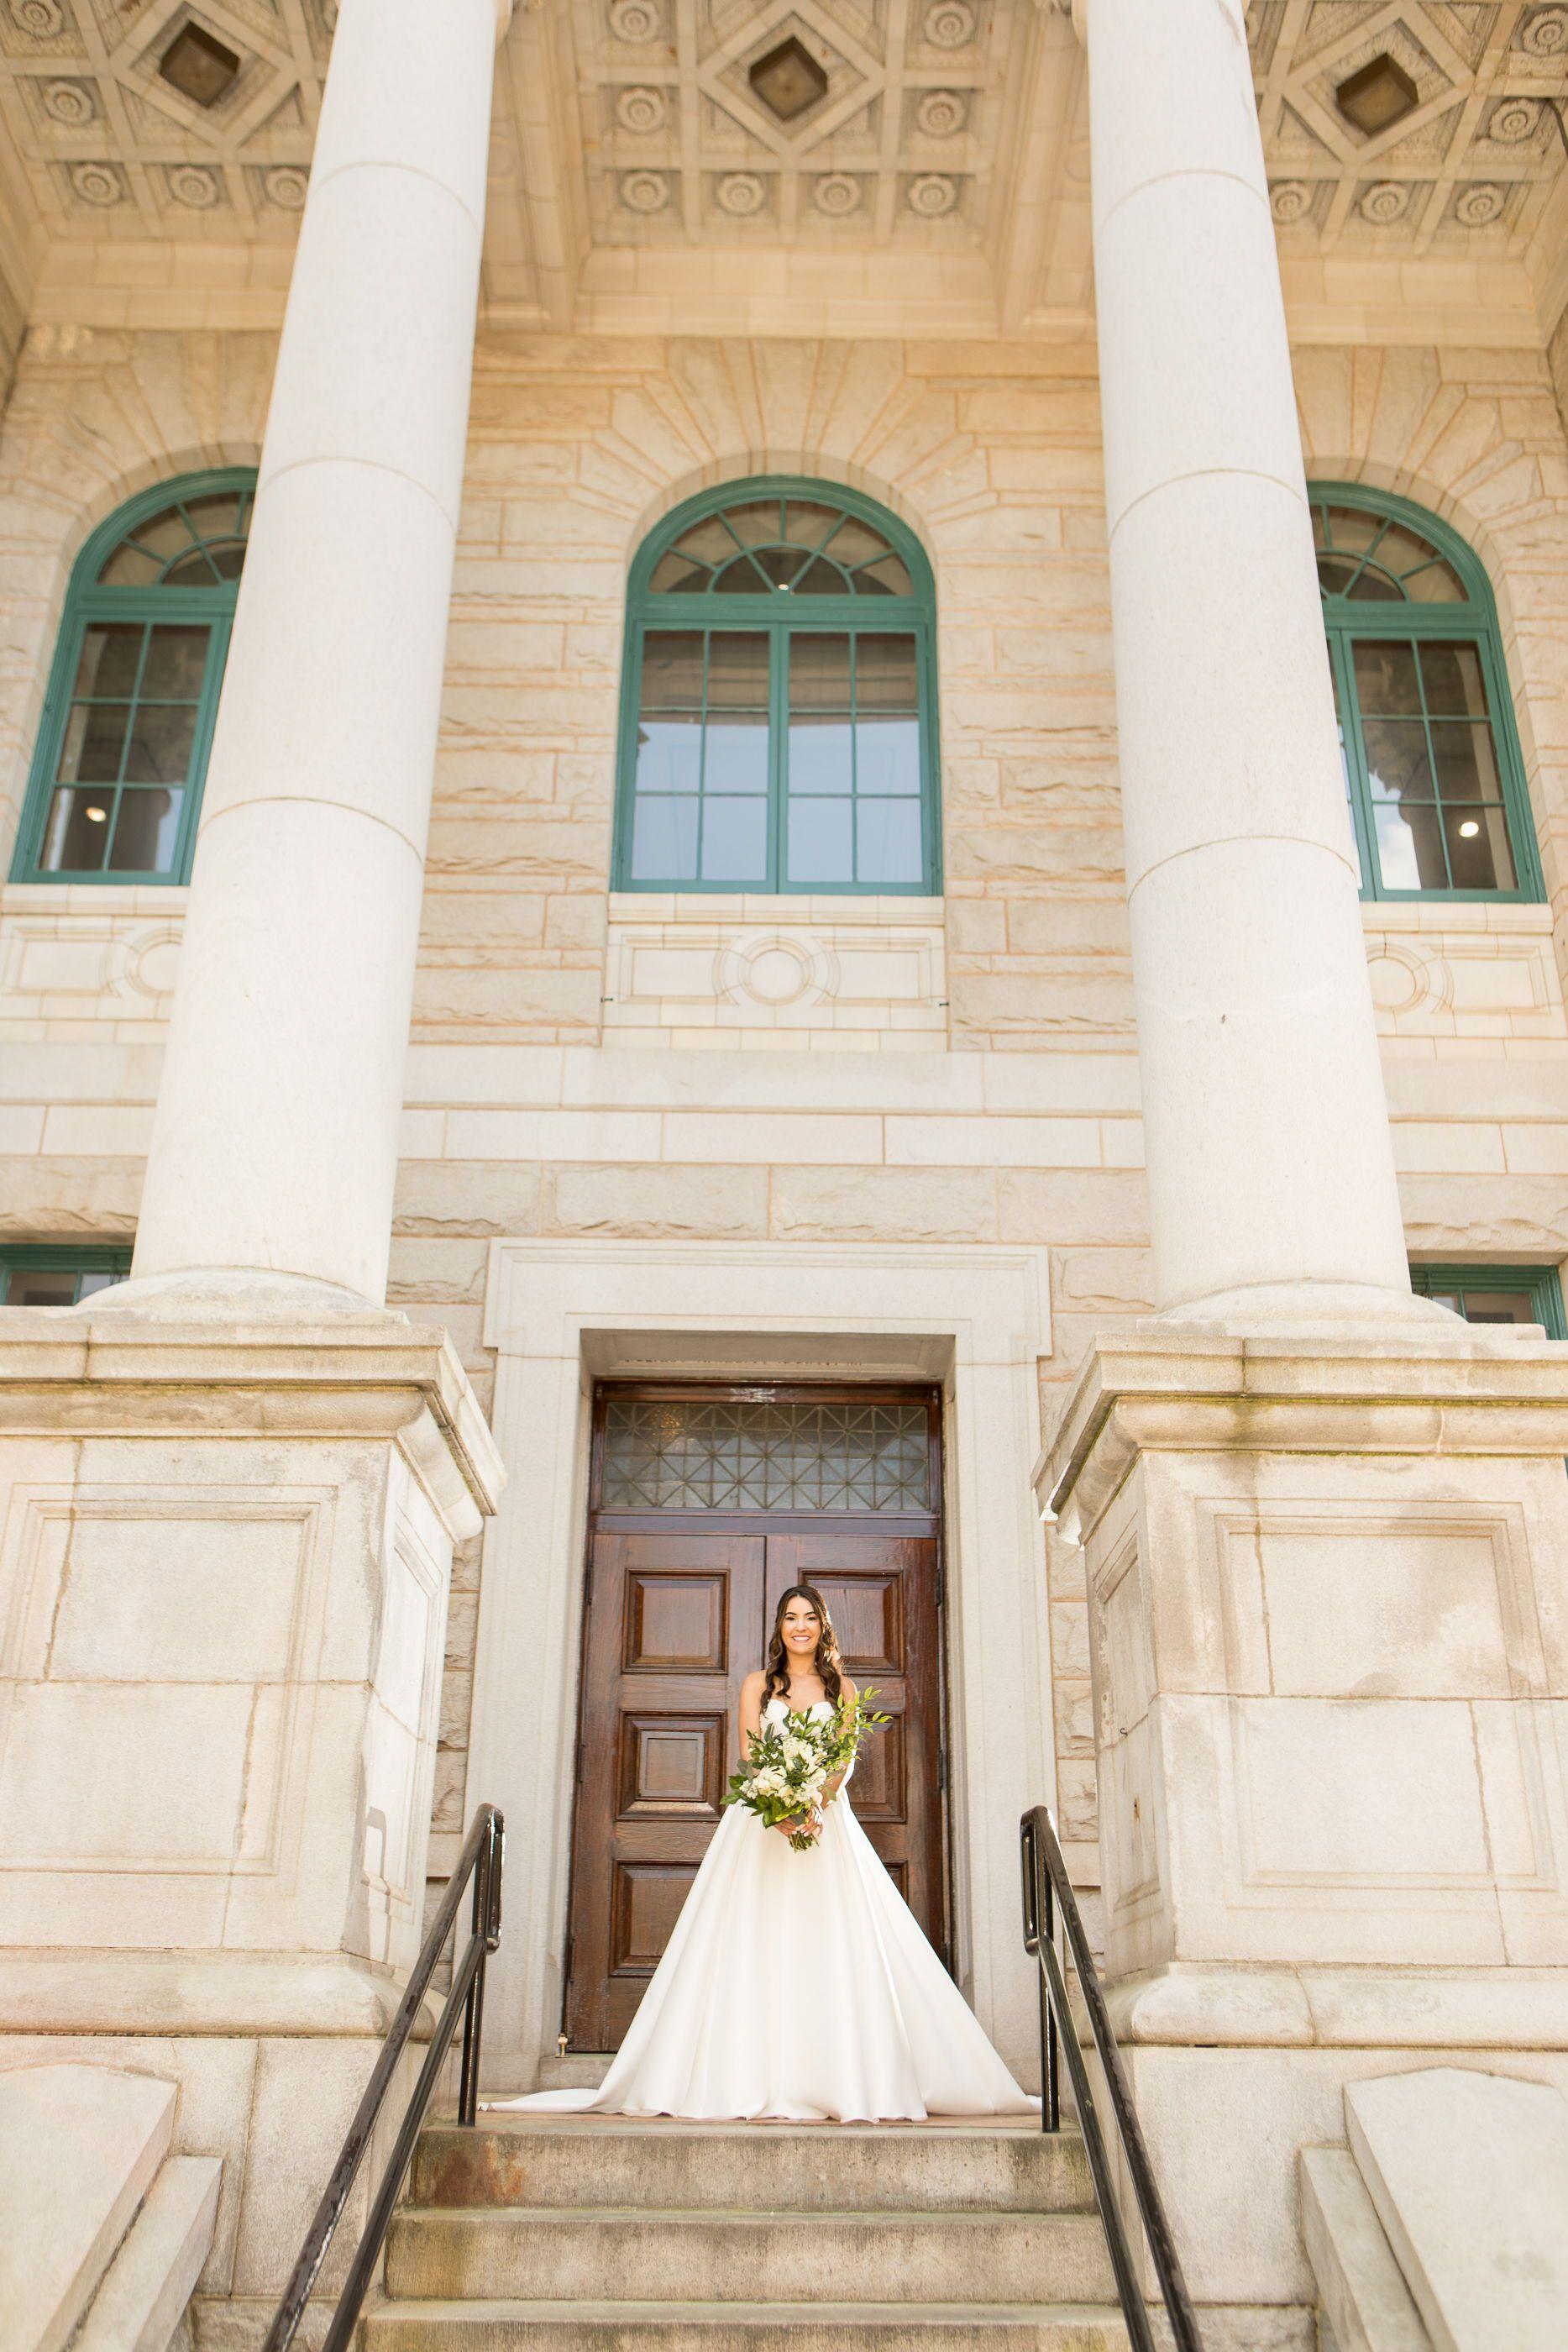 Beautiful bride virginia looking absolutely stunning